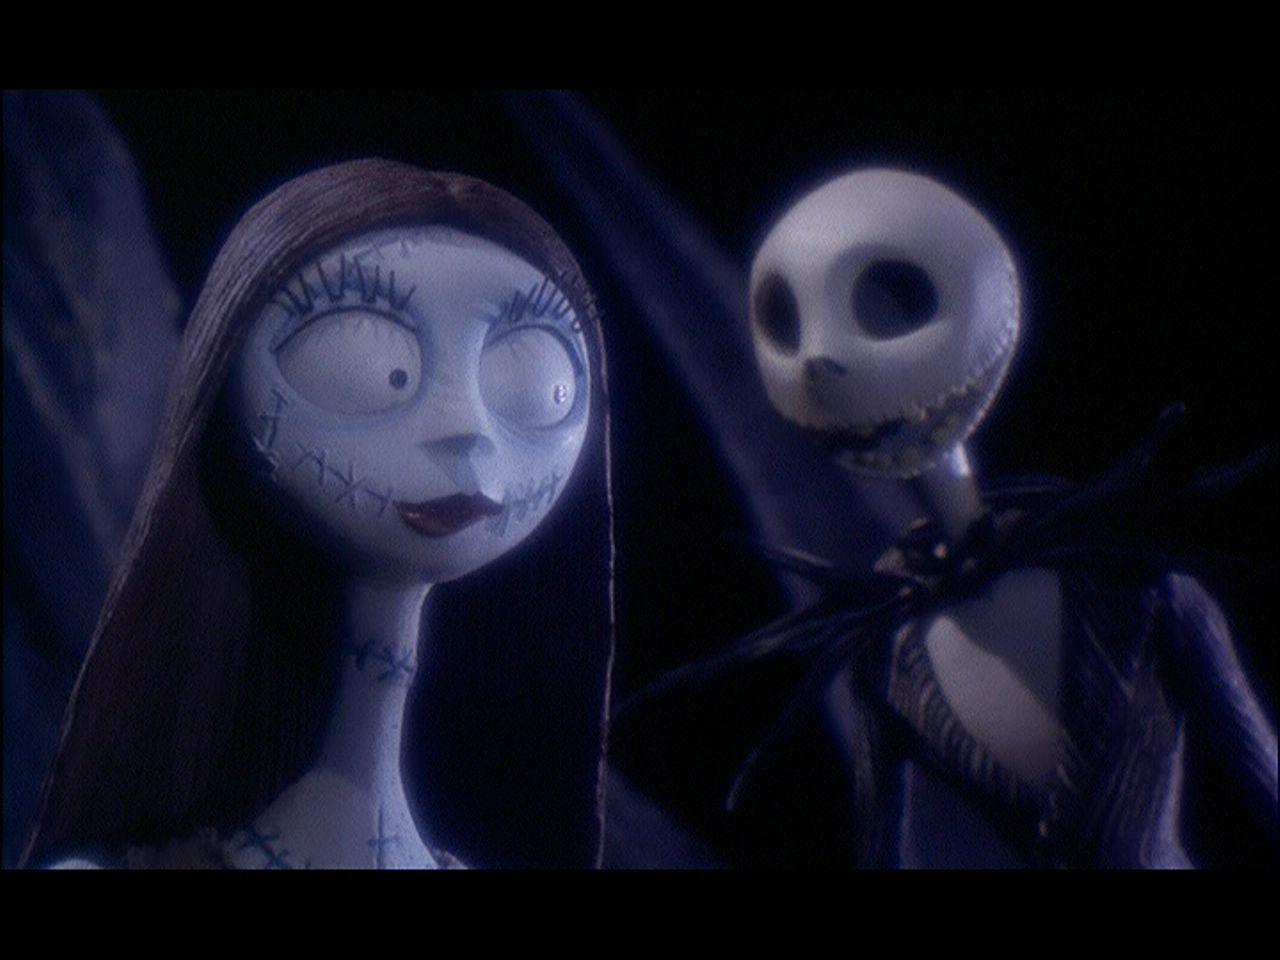 Jack and Sally - Tim Burton Image (18279218) - Fanpop